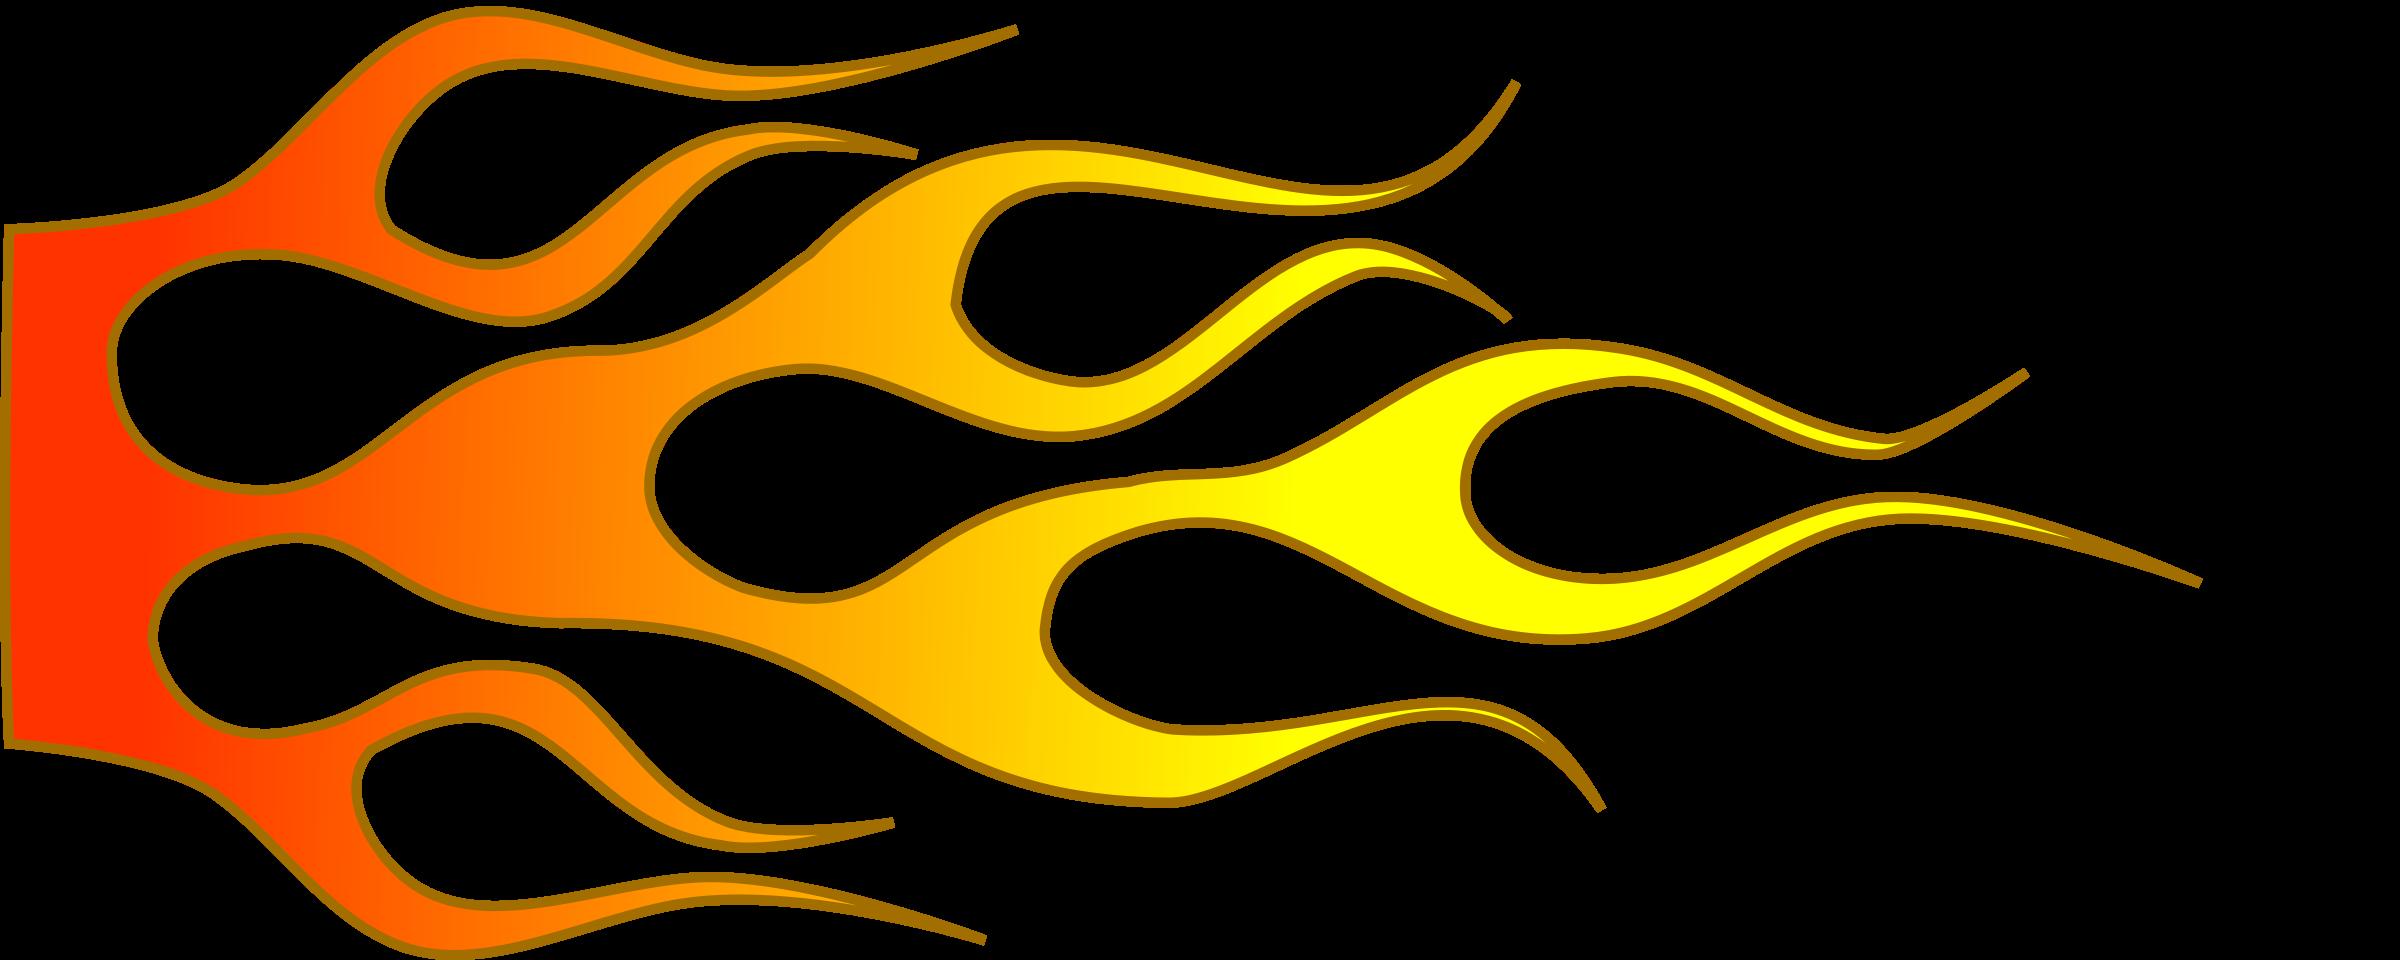 Flame logo designs clipart